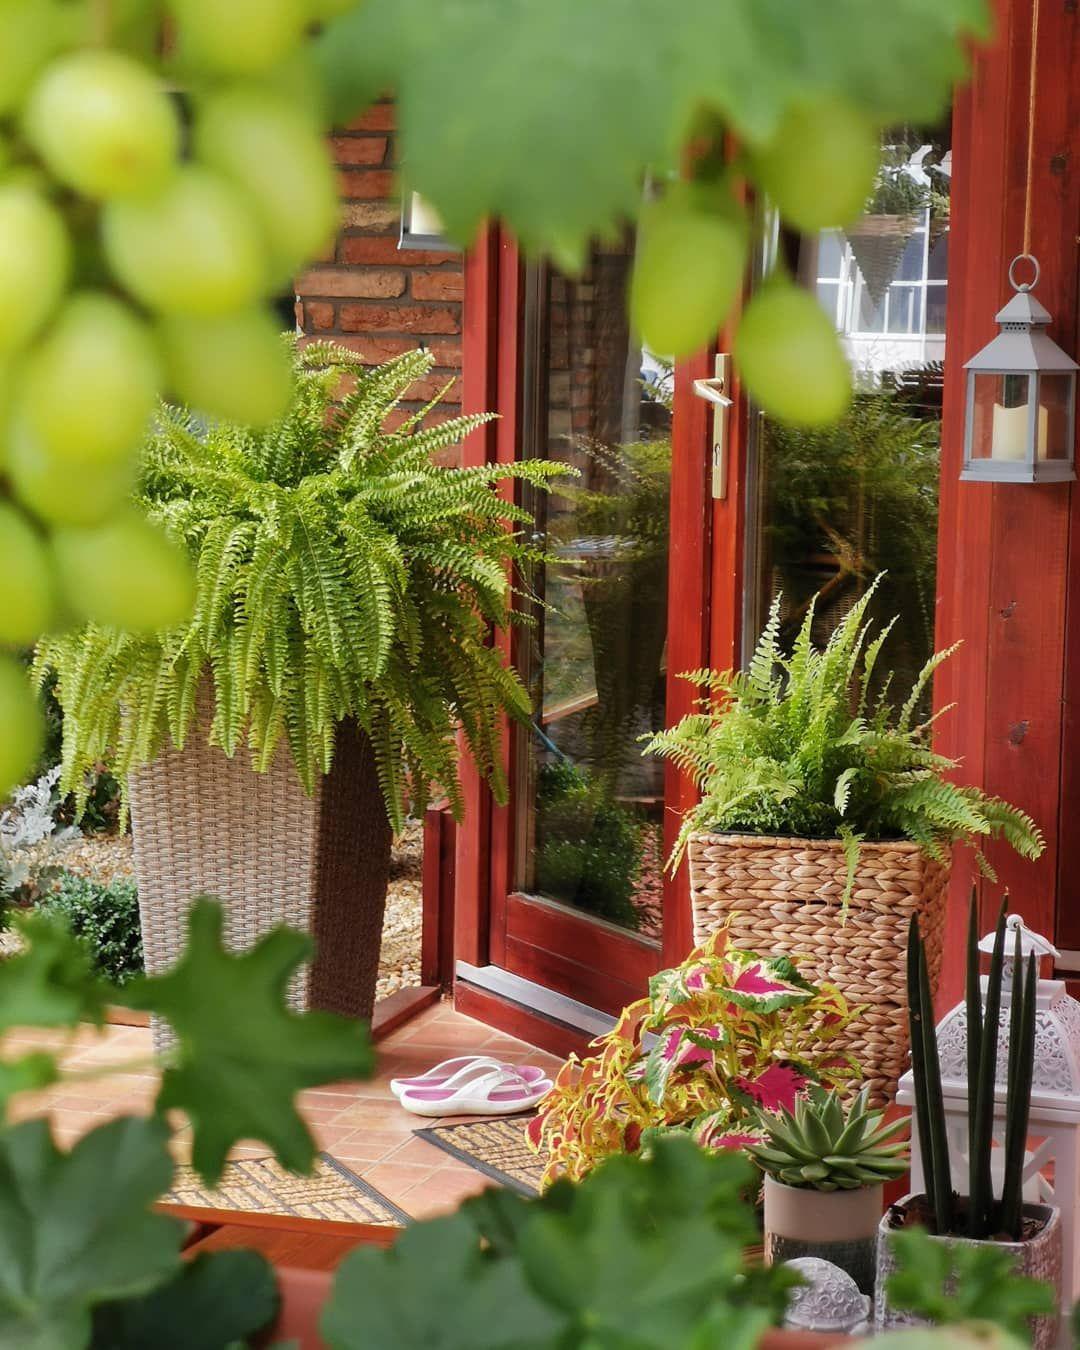 My Lovely Small Garden Small garden, Biophilic